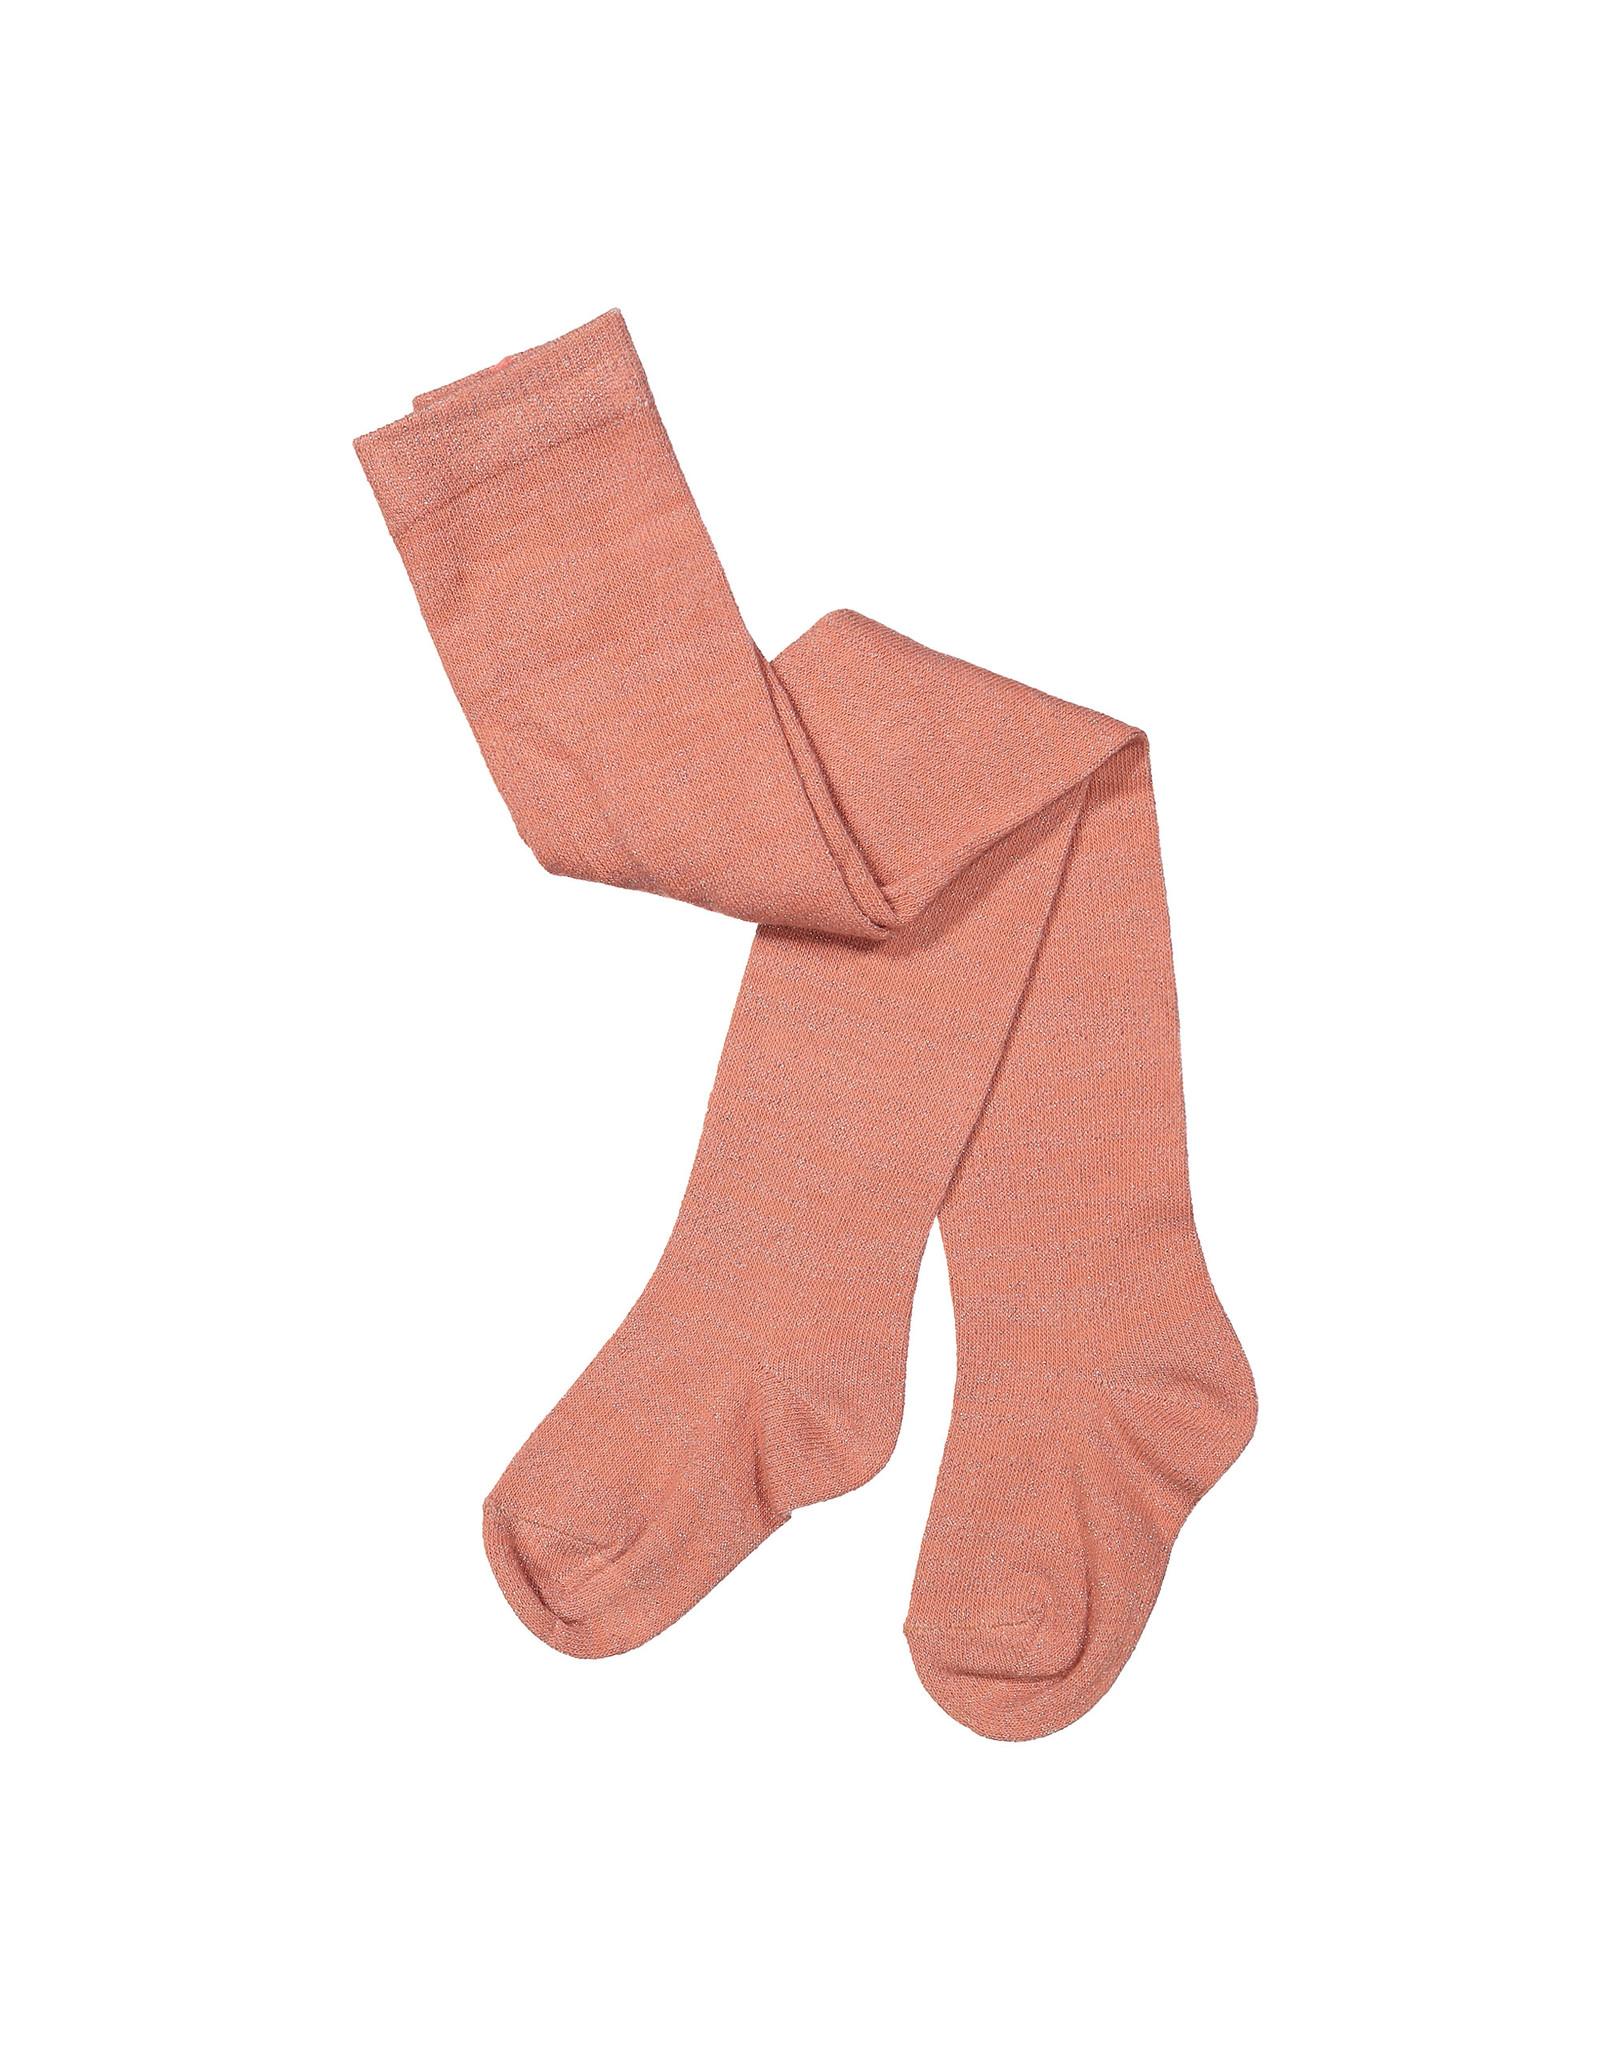 Koko Noko Girls 2-pack tights Dusty pink + navy